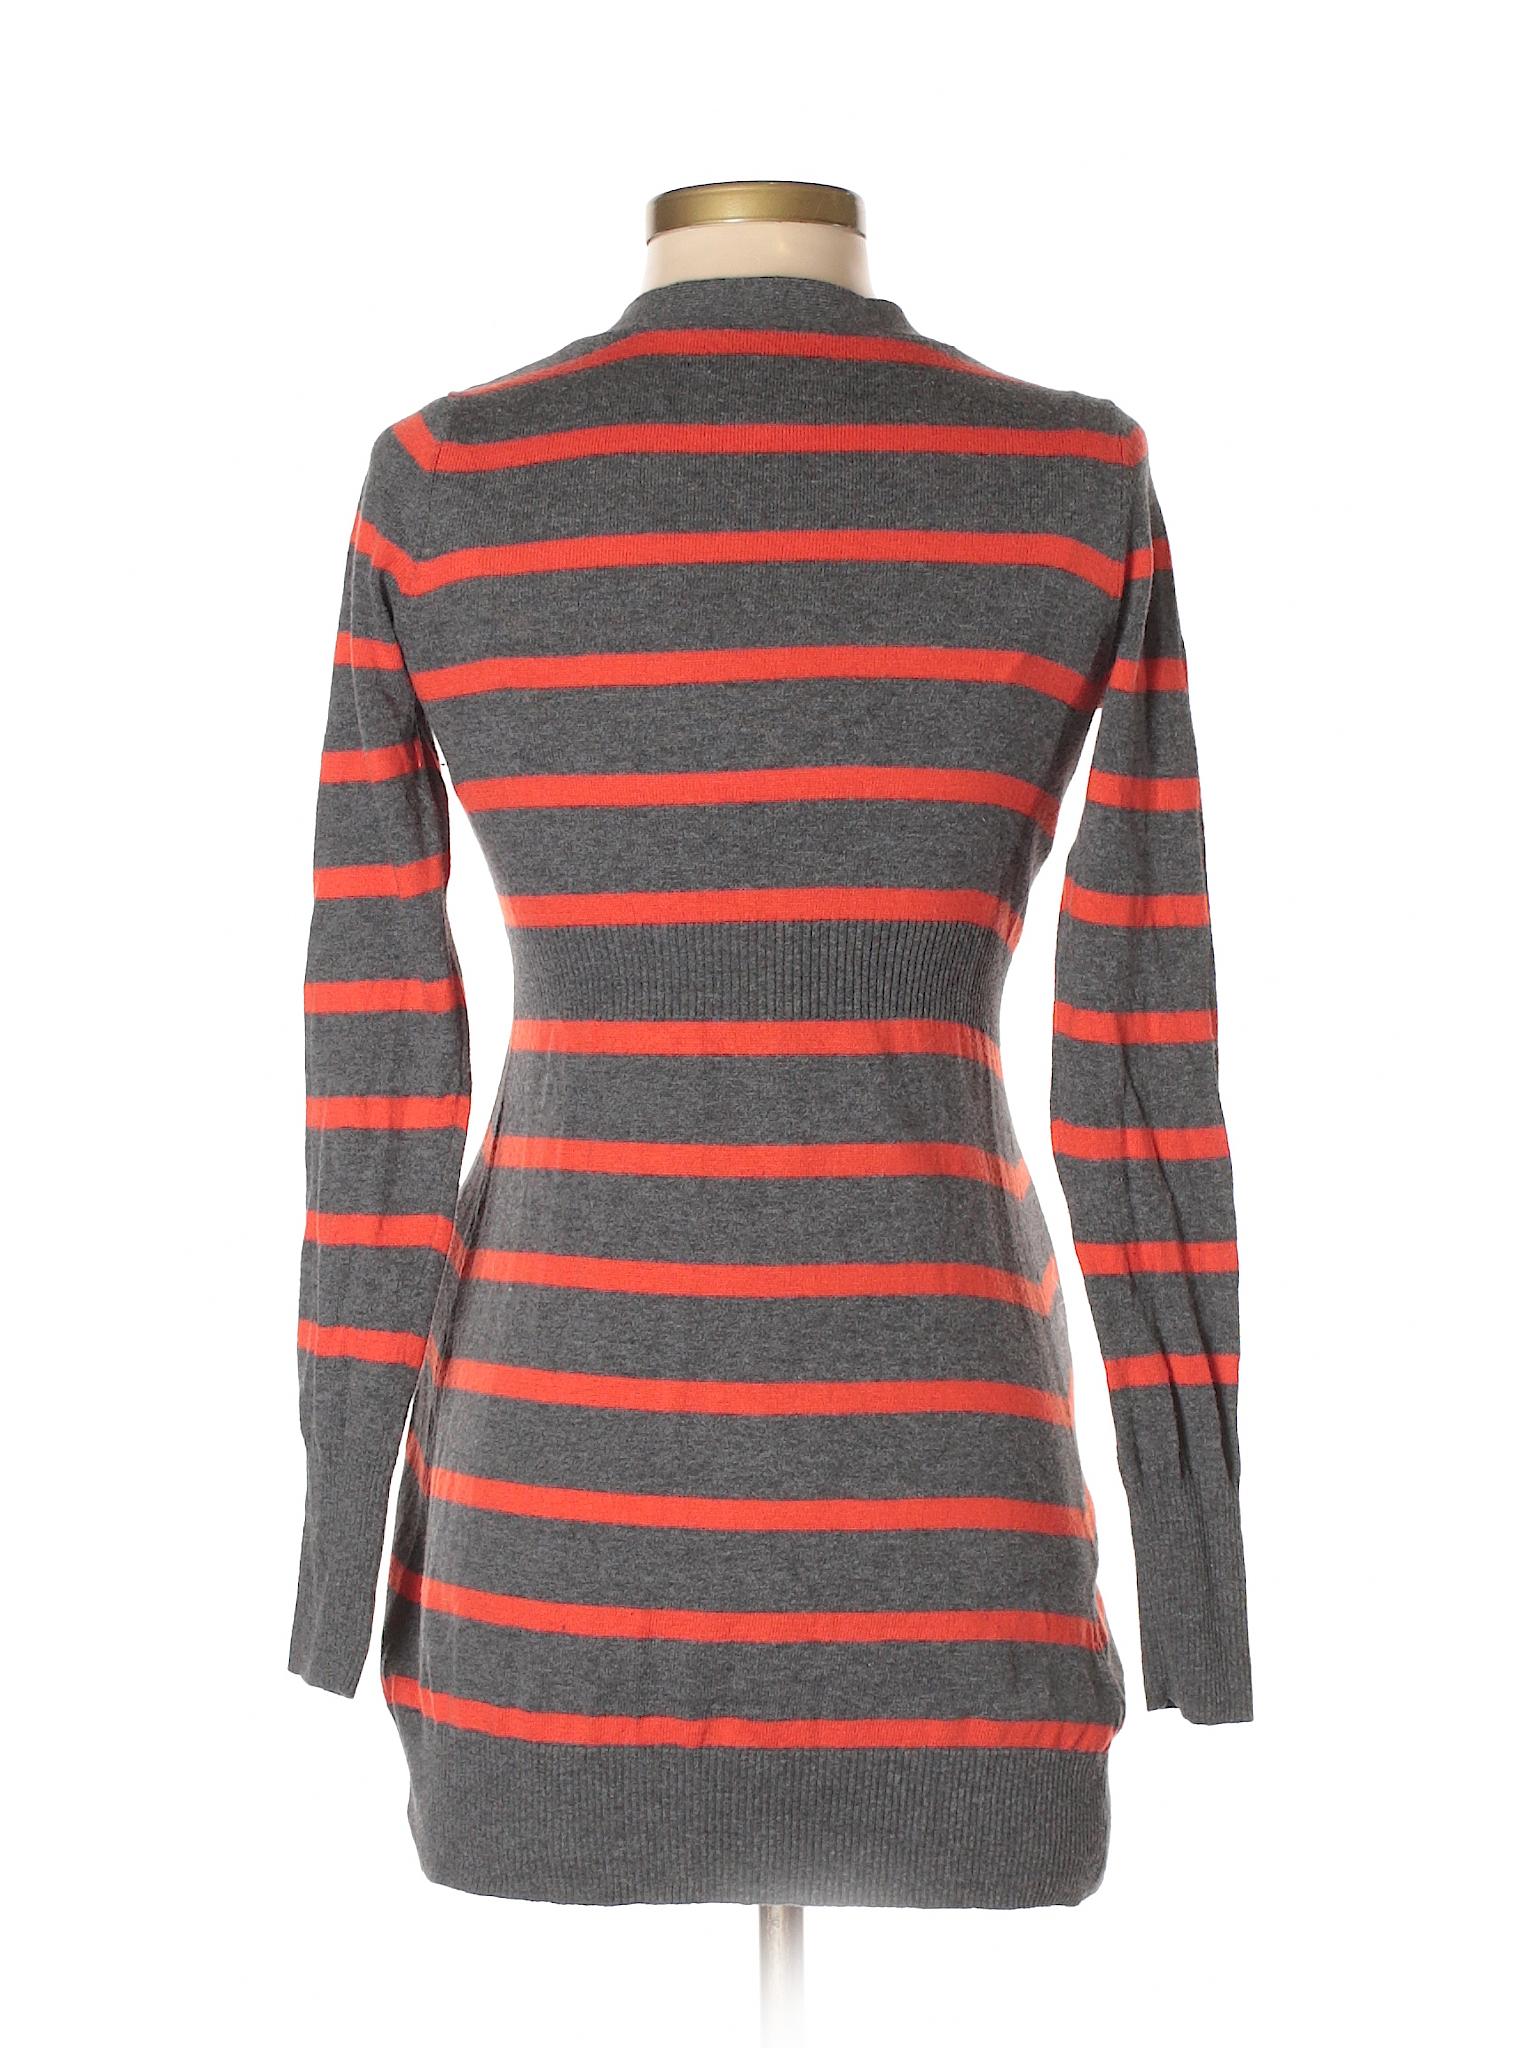 e48202d324493 Old Navy - Maternity Stripes Gray Cardigan Size XS (Maternity) - 61% off |  thredUP